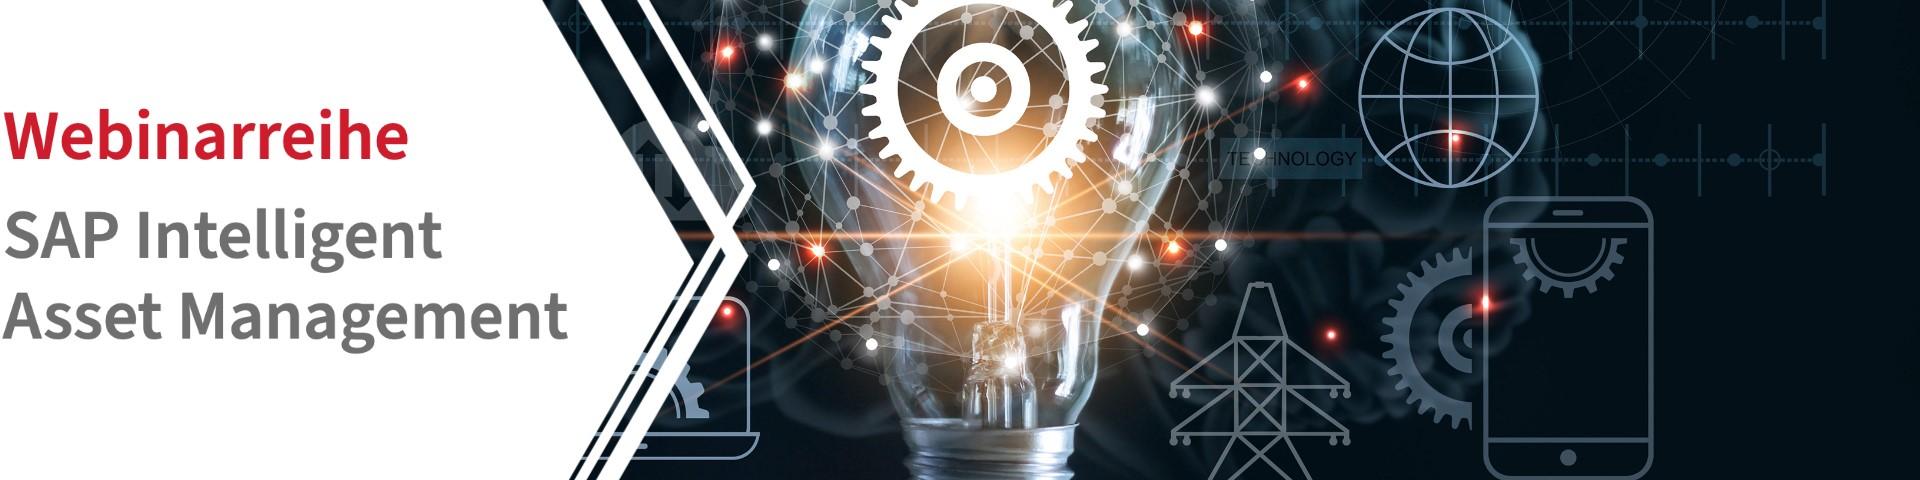 Webinarreihe SAP Intelligent Asset Management; Orianda Solutions AG